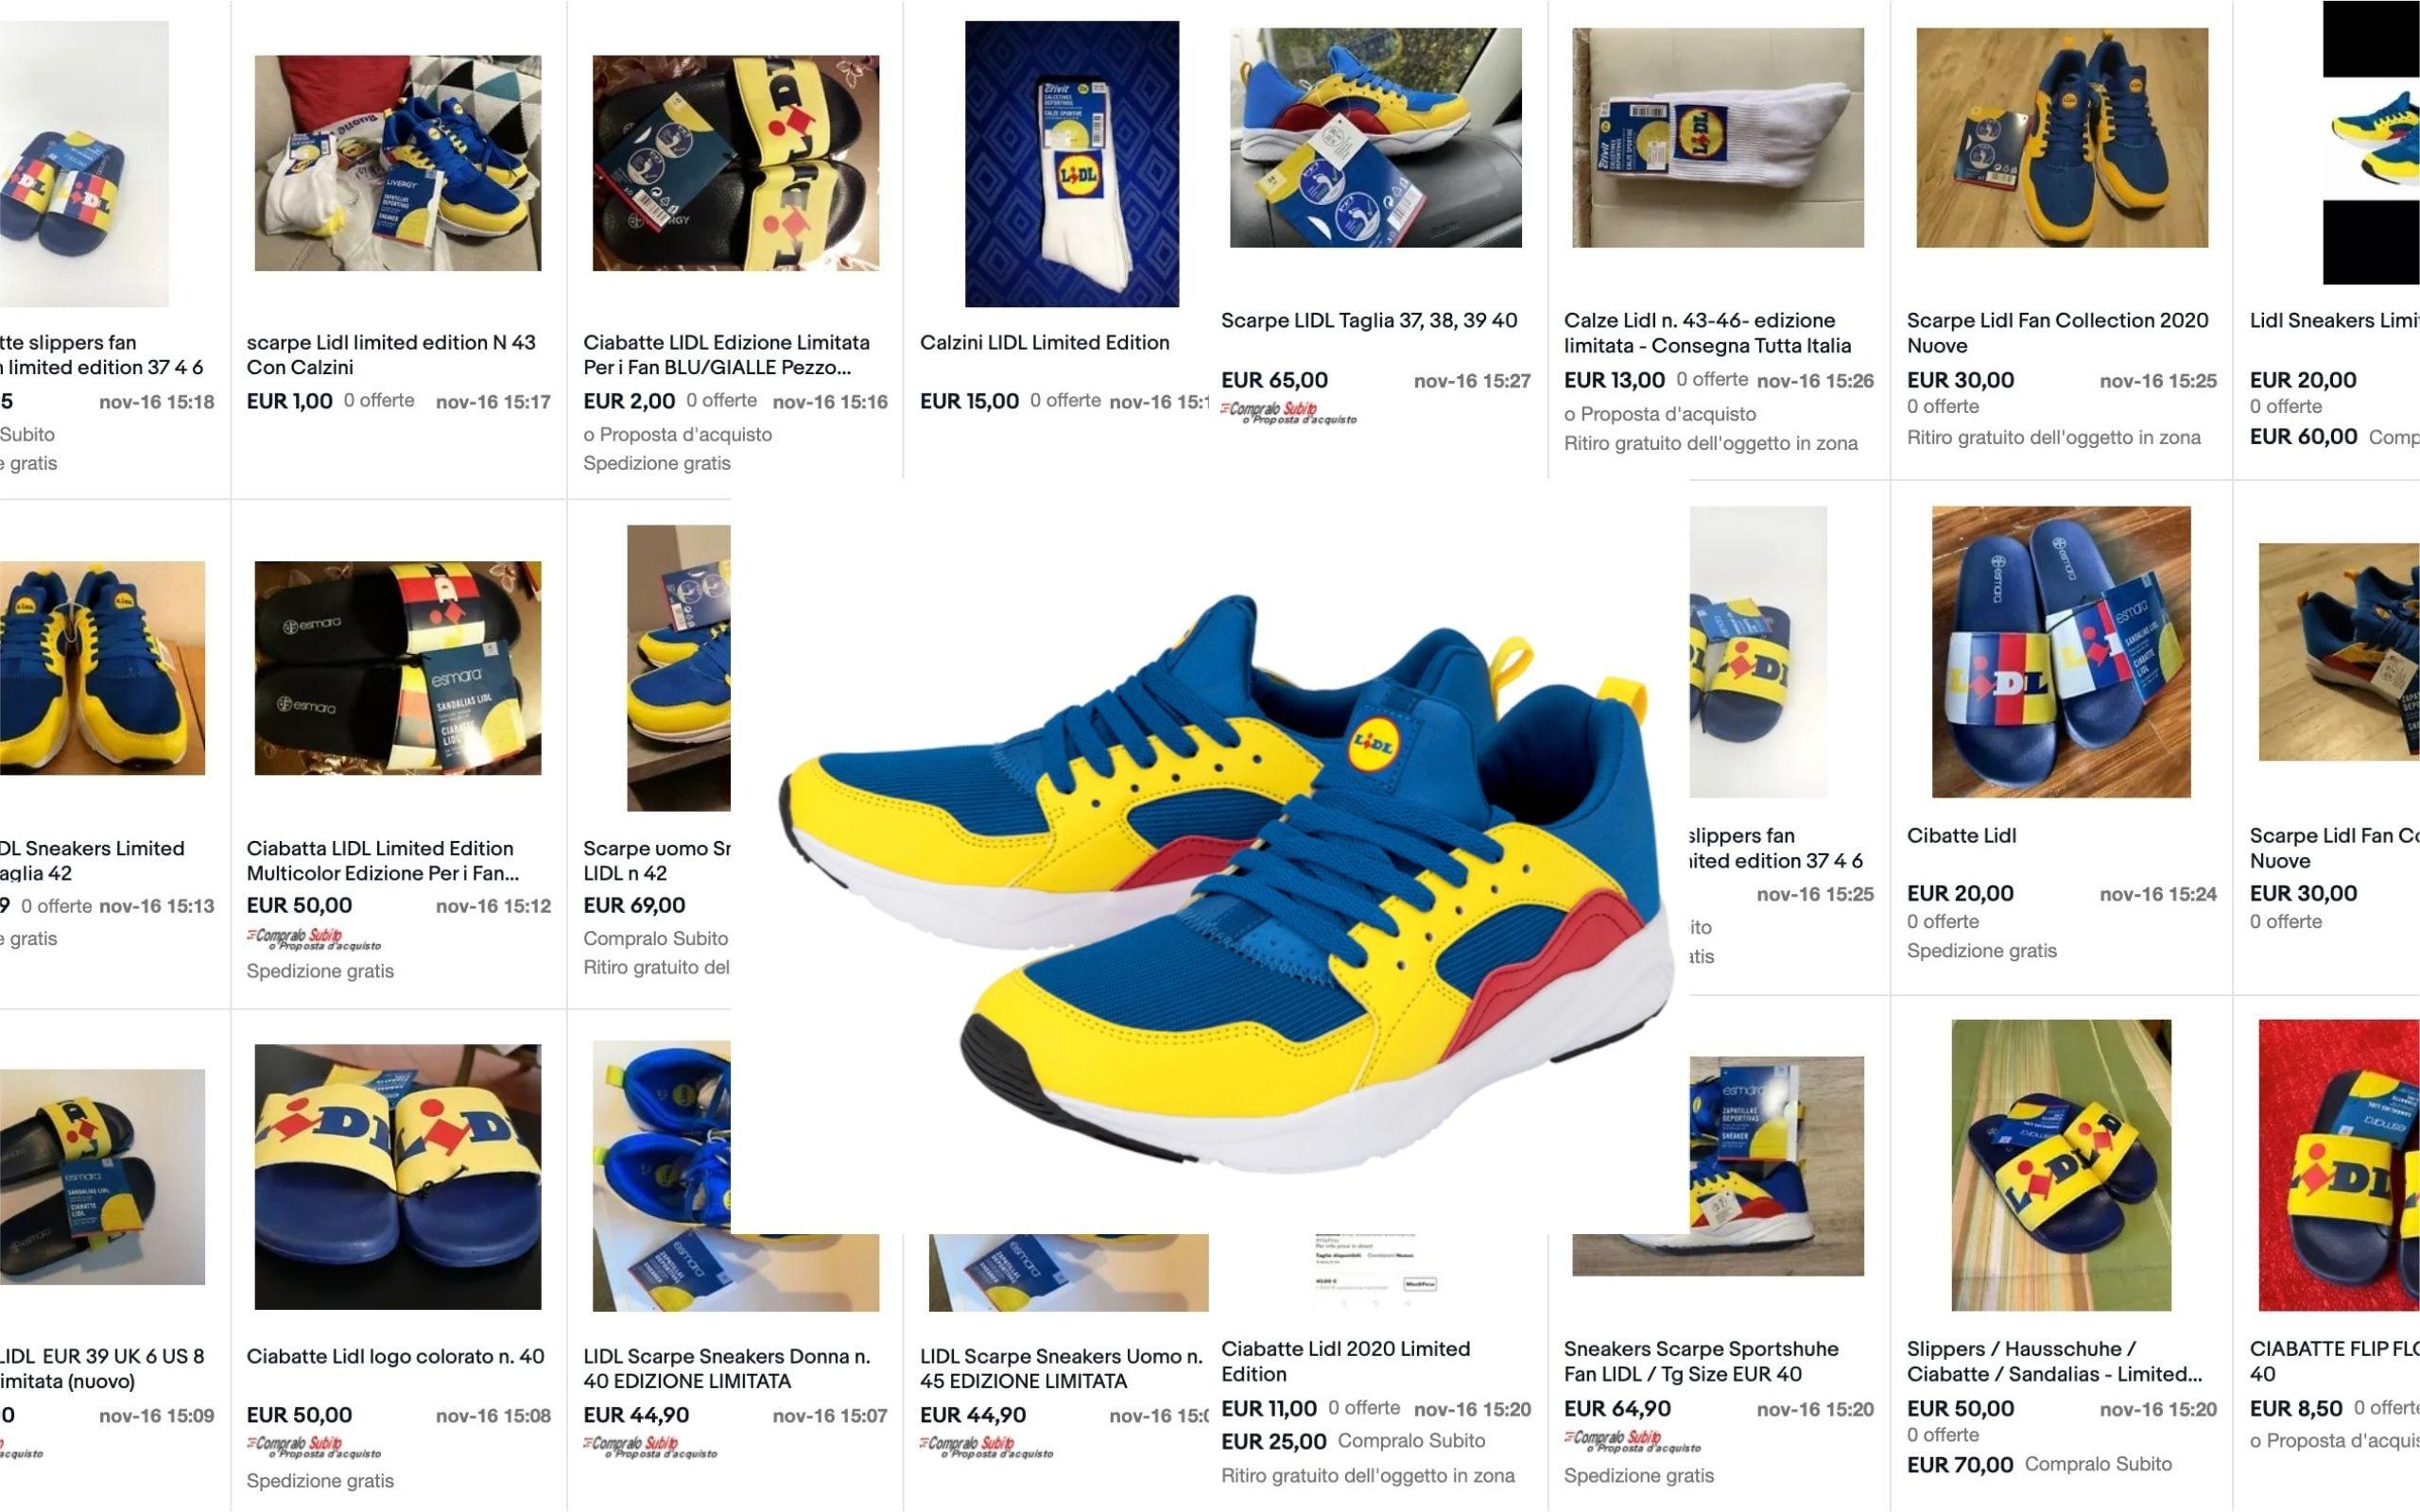 Scarpe Lidl in vendita su Ebay